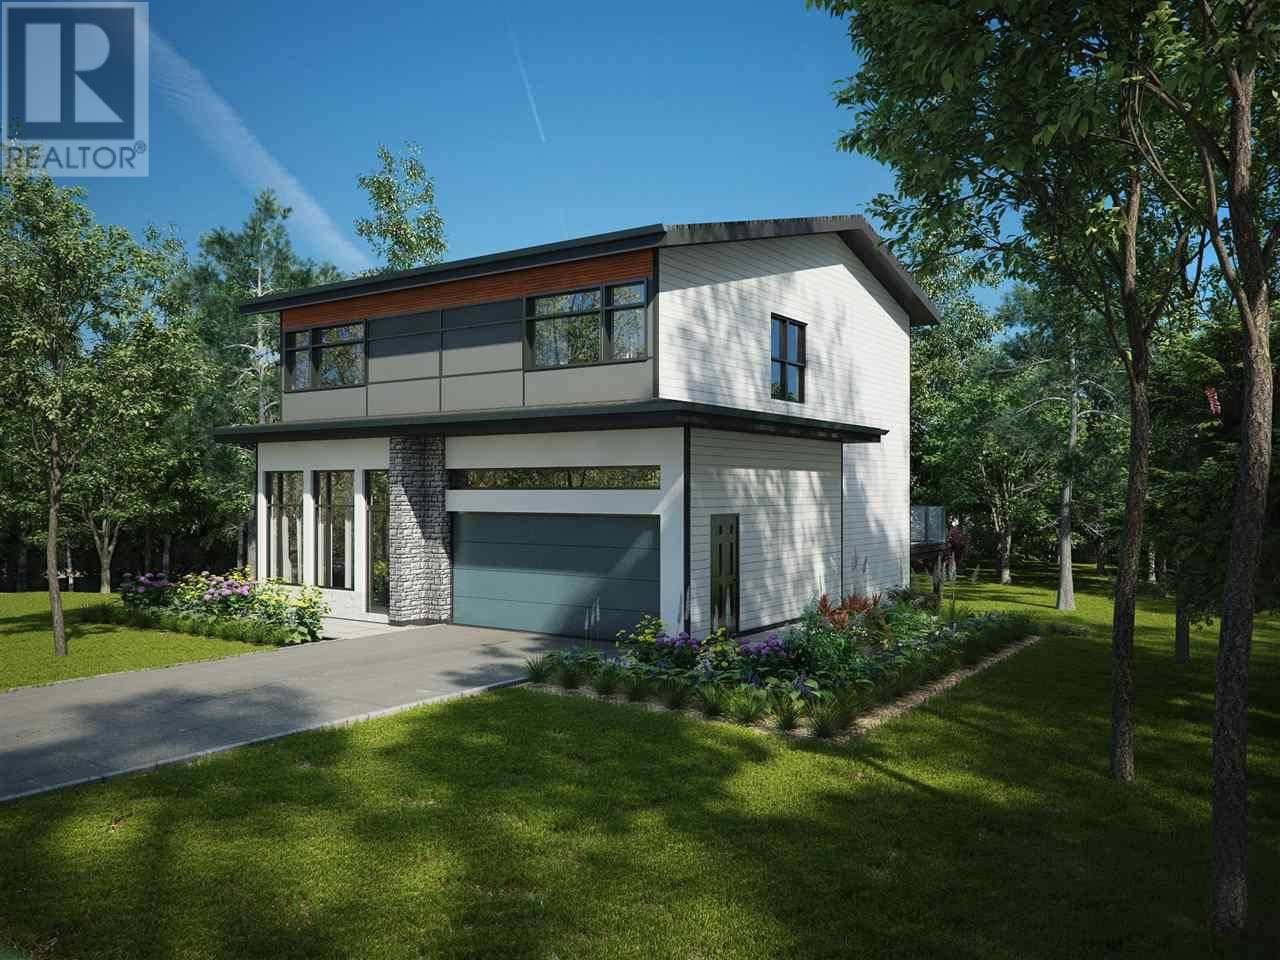 House for sale at 176 Cutter Dr Unit Lot Cd31 Halifax Nova Scotia - MLS: 201919369